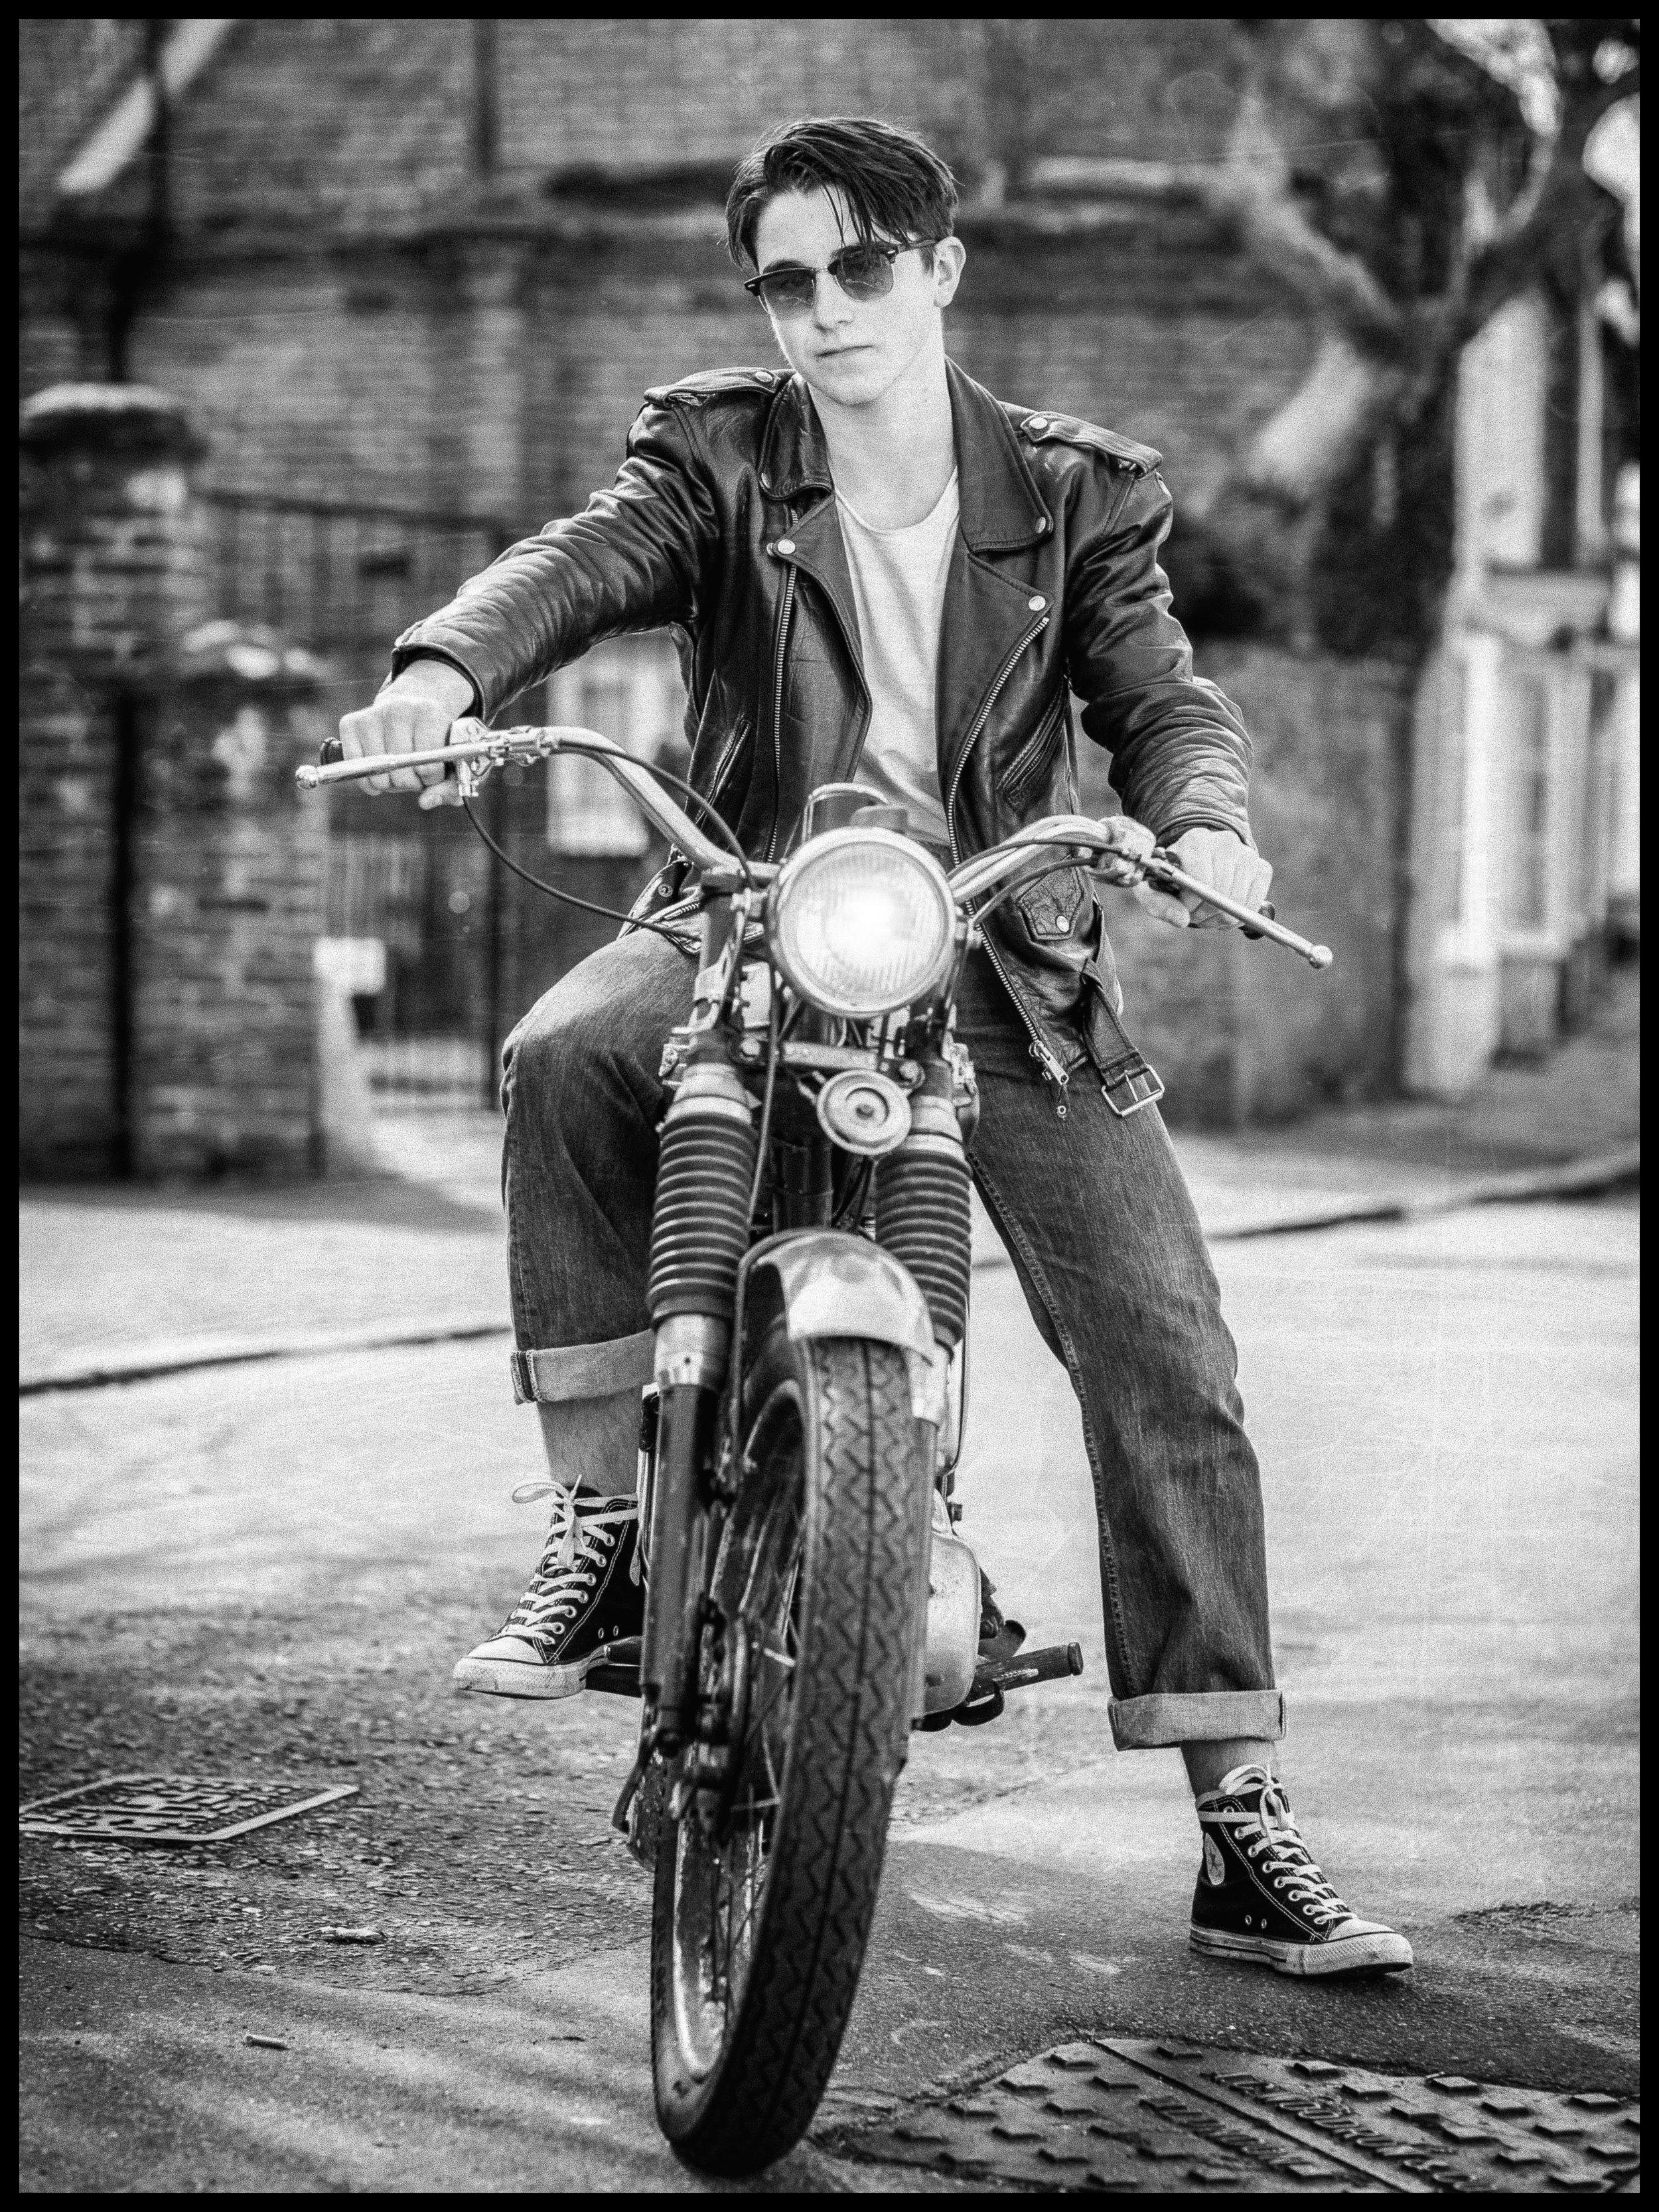 1950s Biker Portrait Time for a Ride